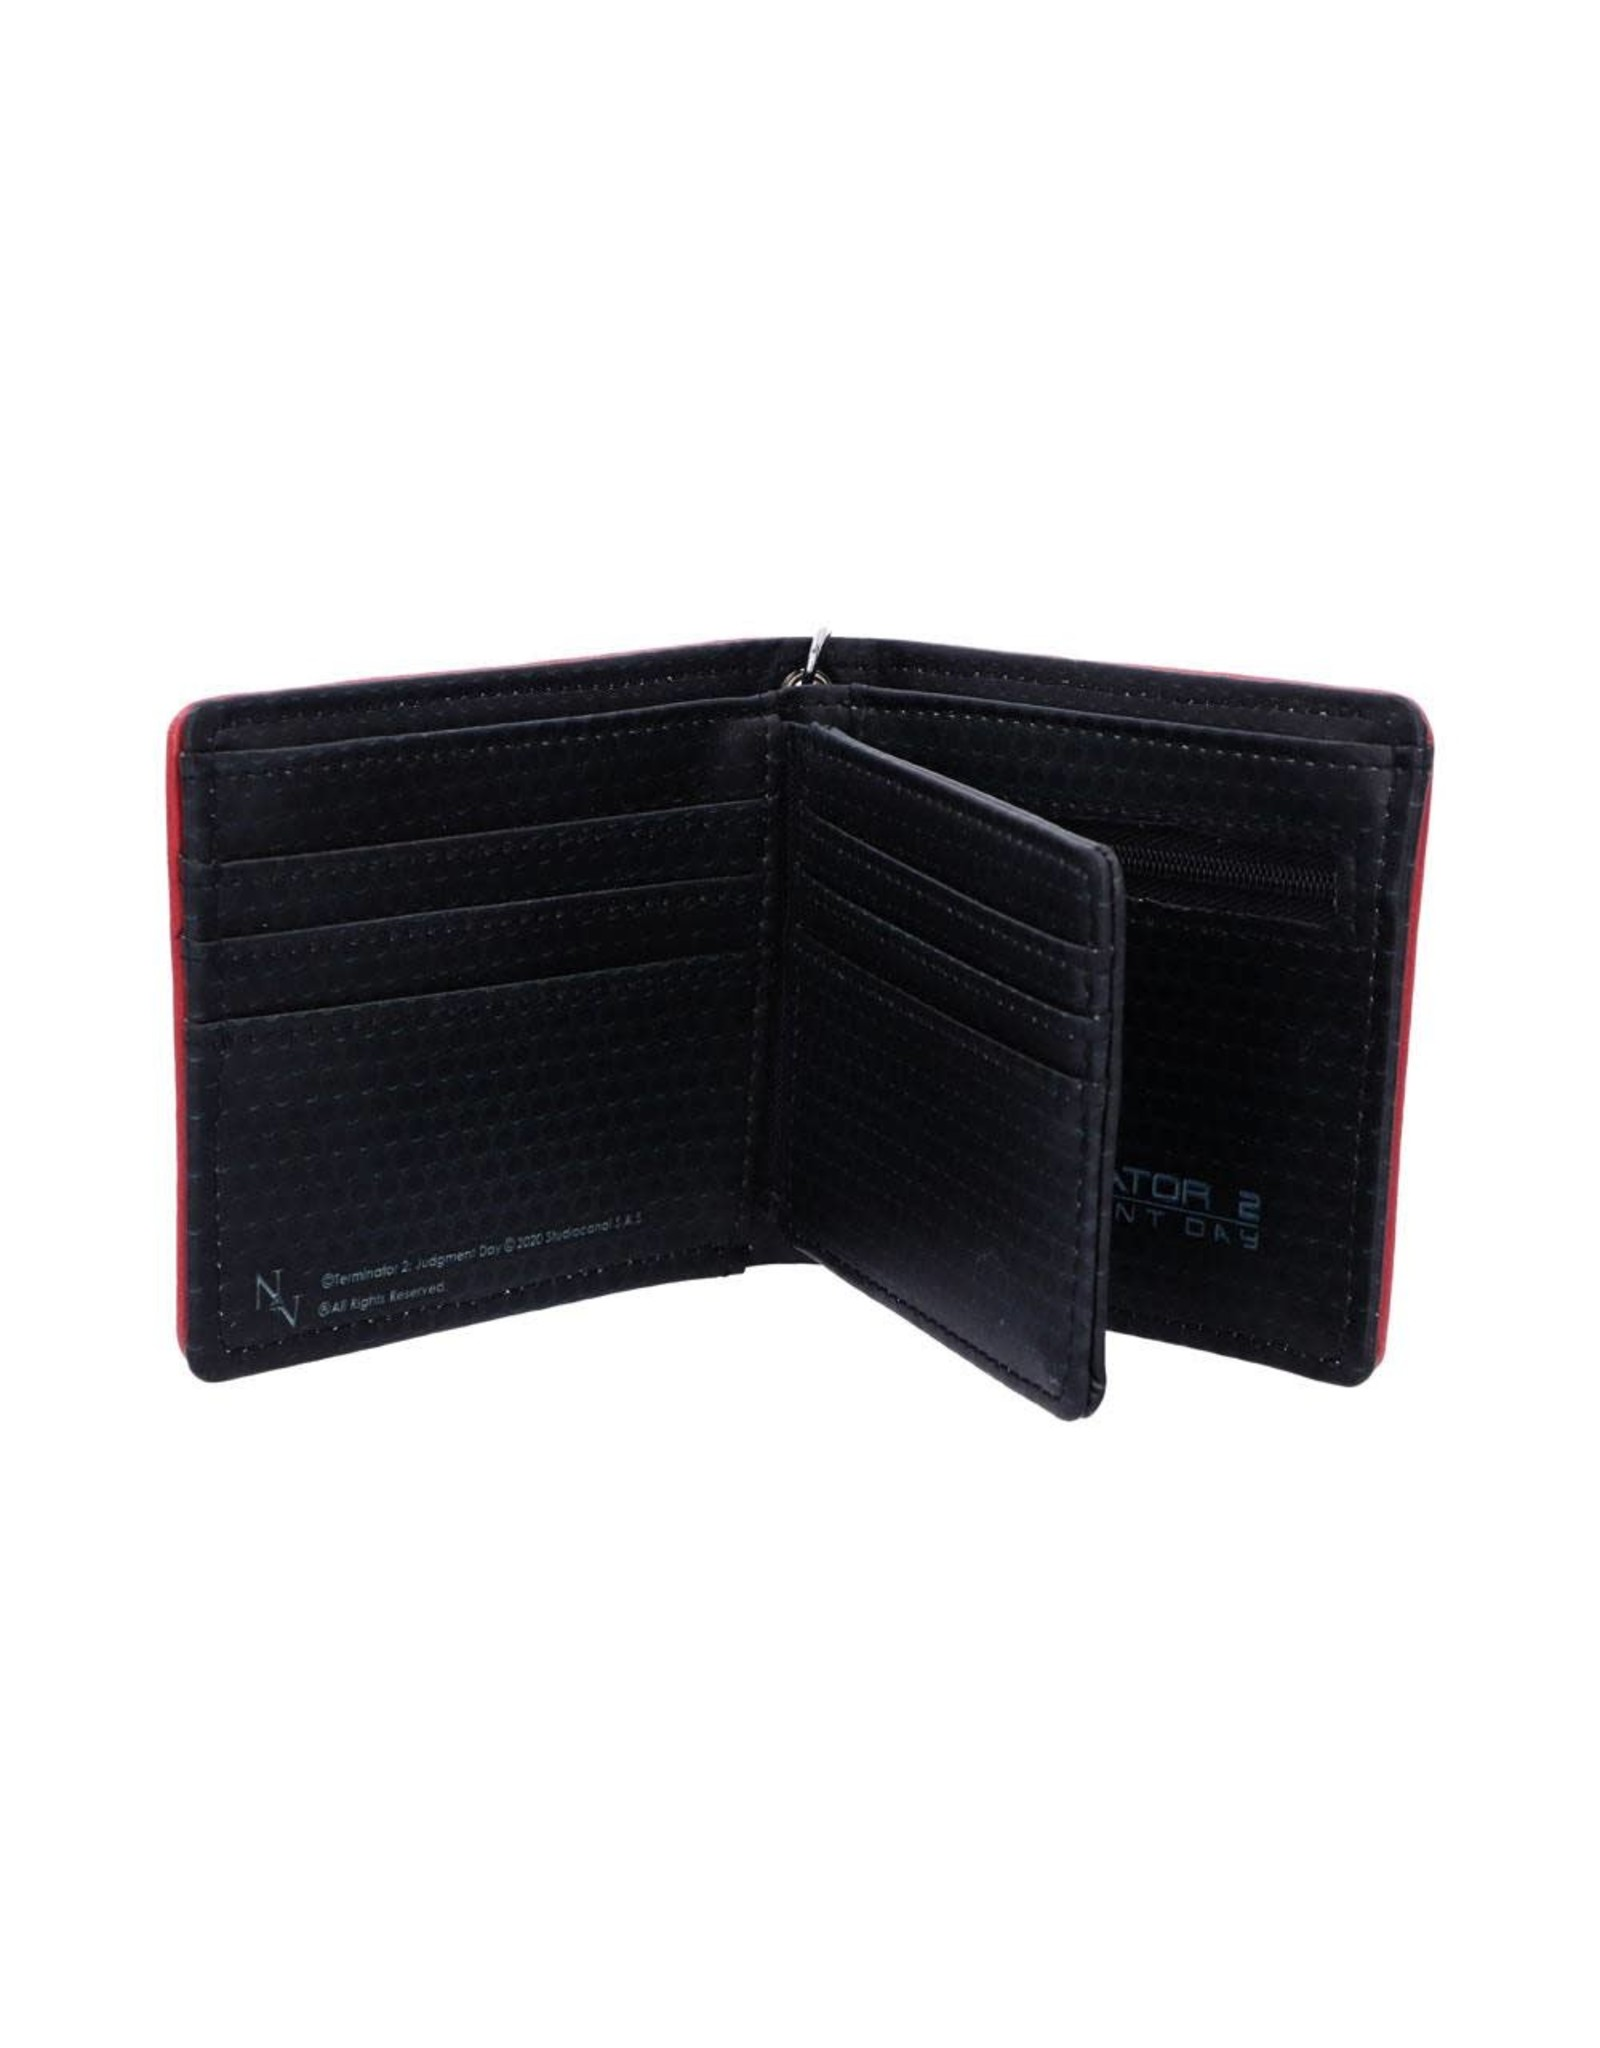 Nemesis Now TERMINATOR 2 Wallet - T-800